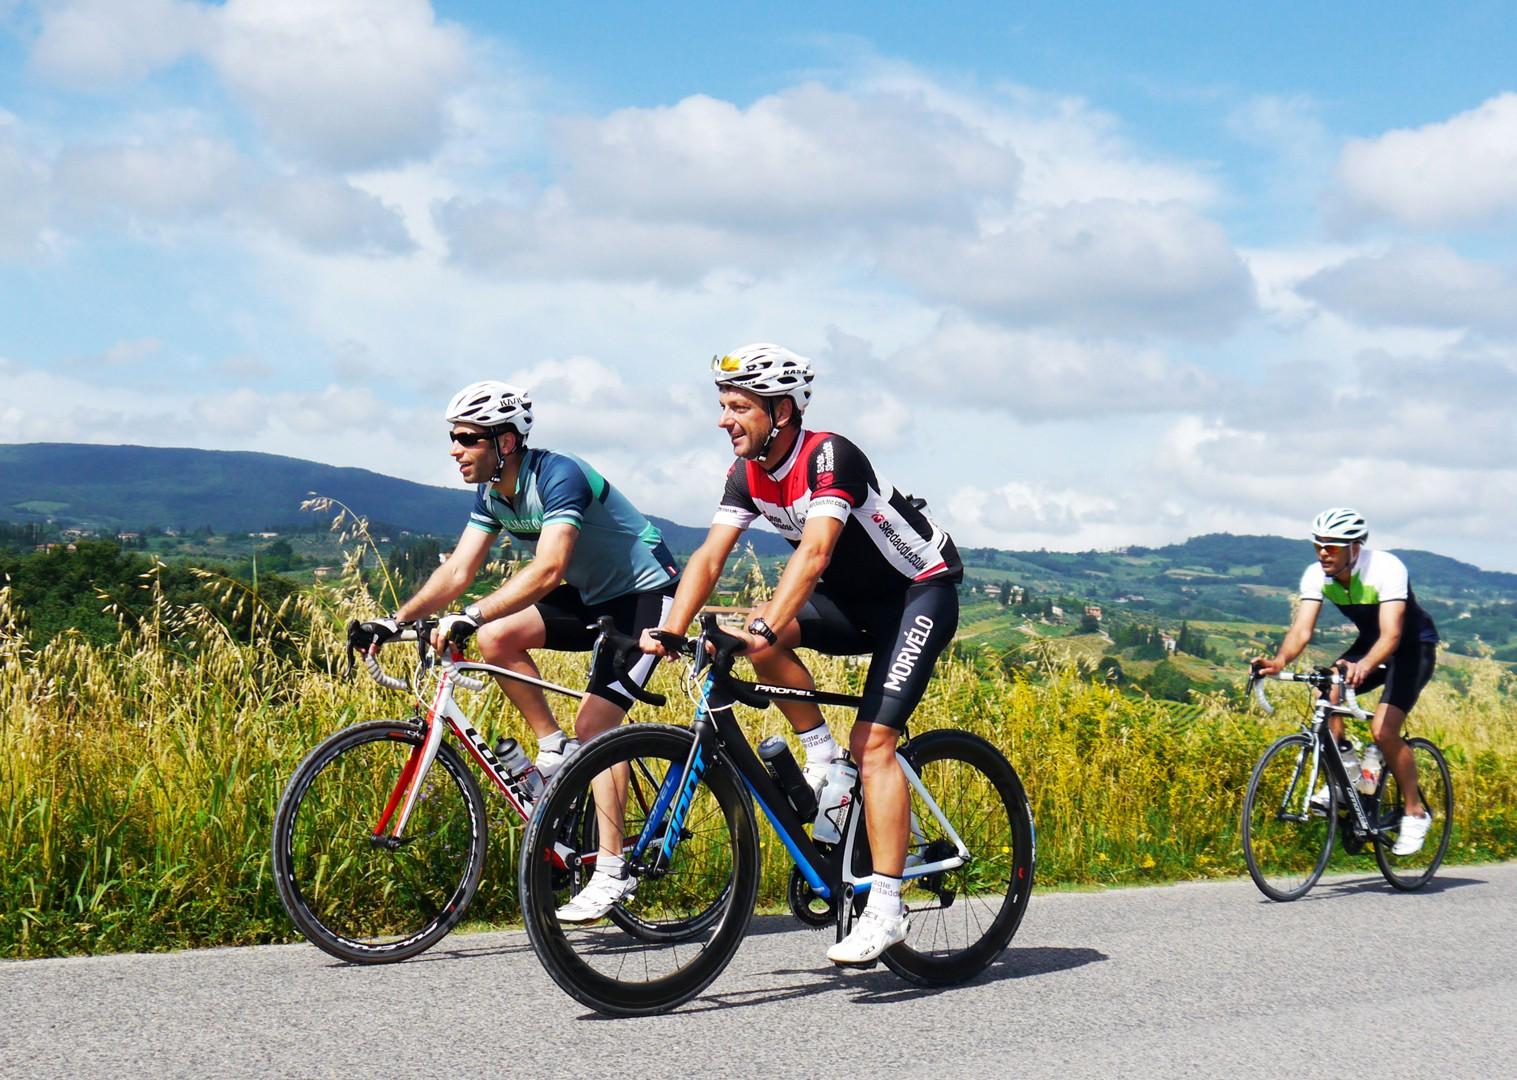 italy-tuscany-guided-cycling-holiday.jpg - Italy - Tuscany Tourer - Guided Road Cycling Holiday - Italia Road Cycling